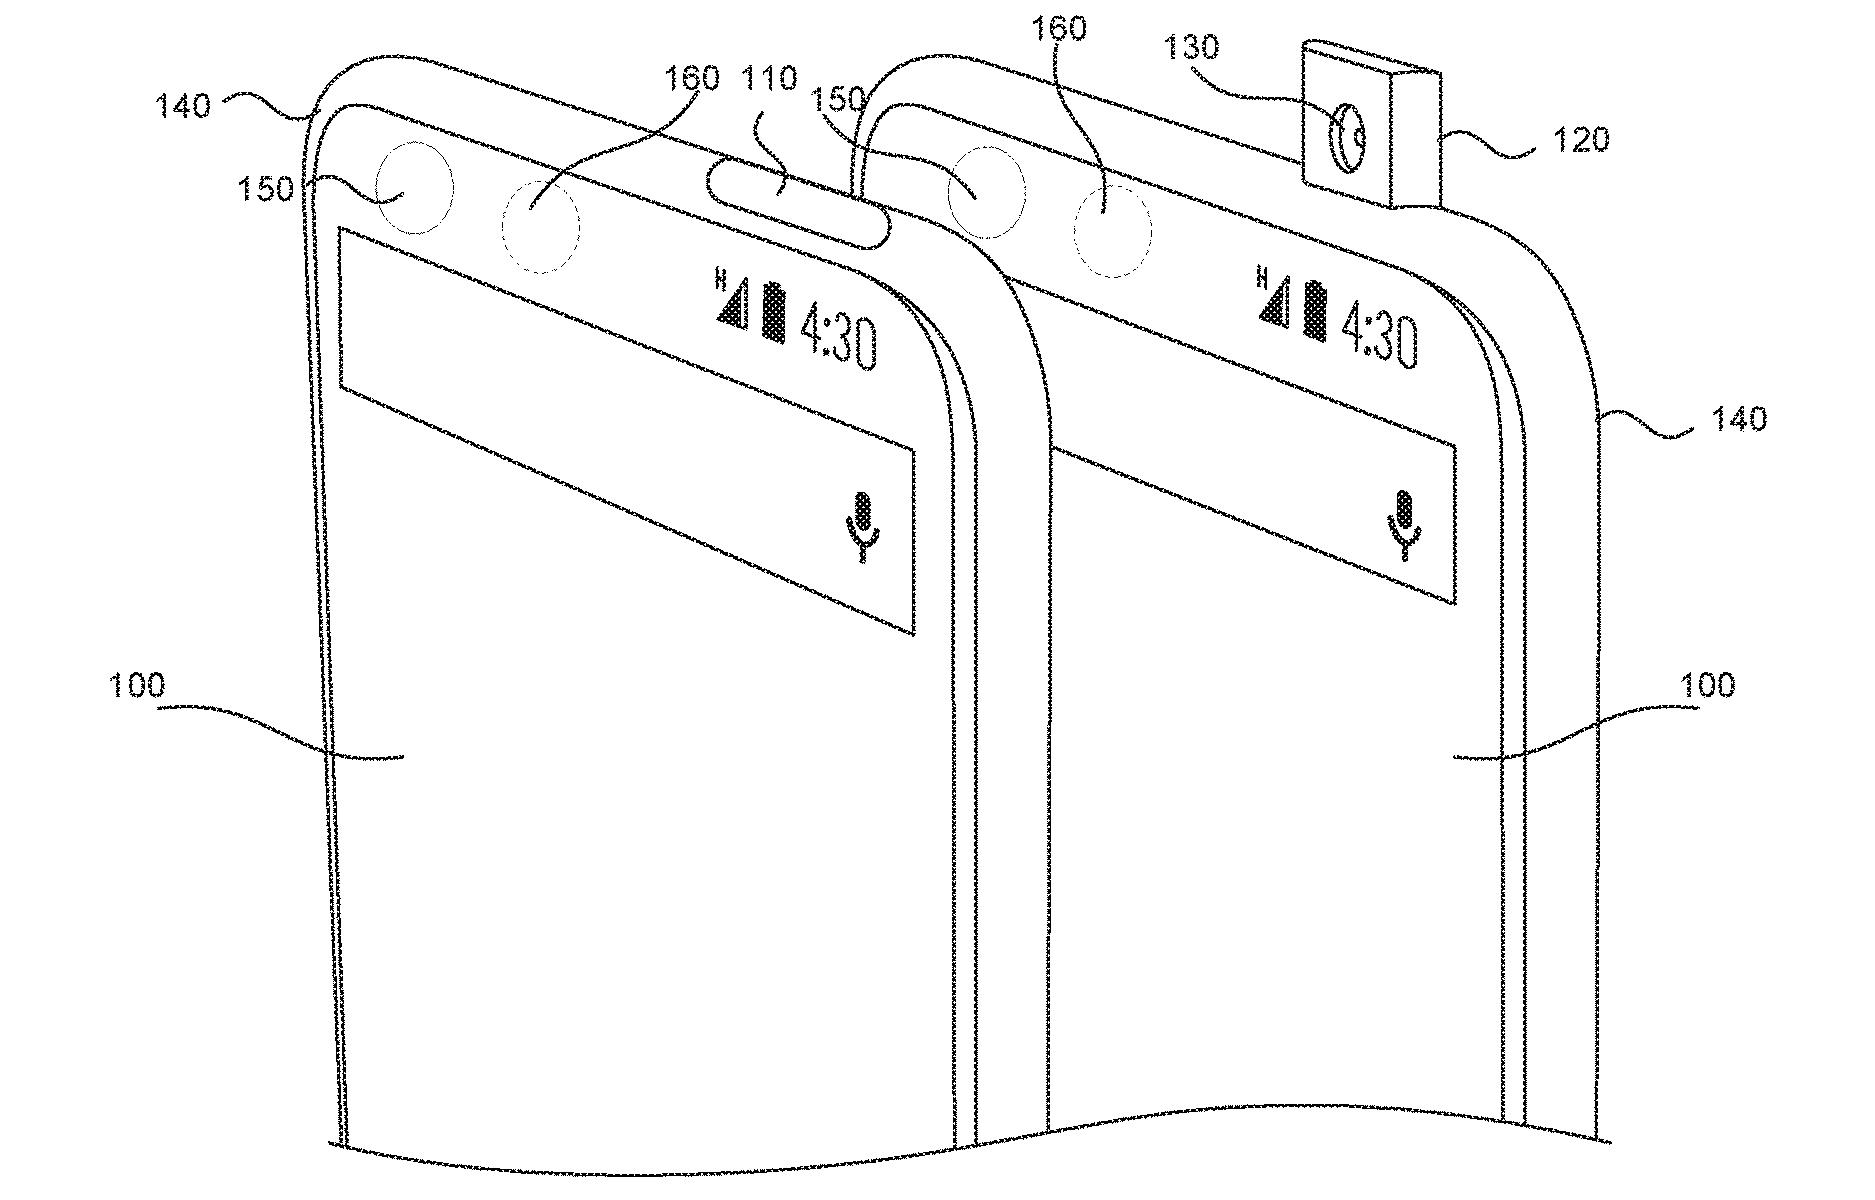 Essential Pop-Up Camera Patent Image